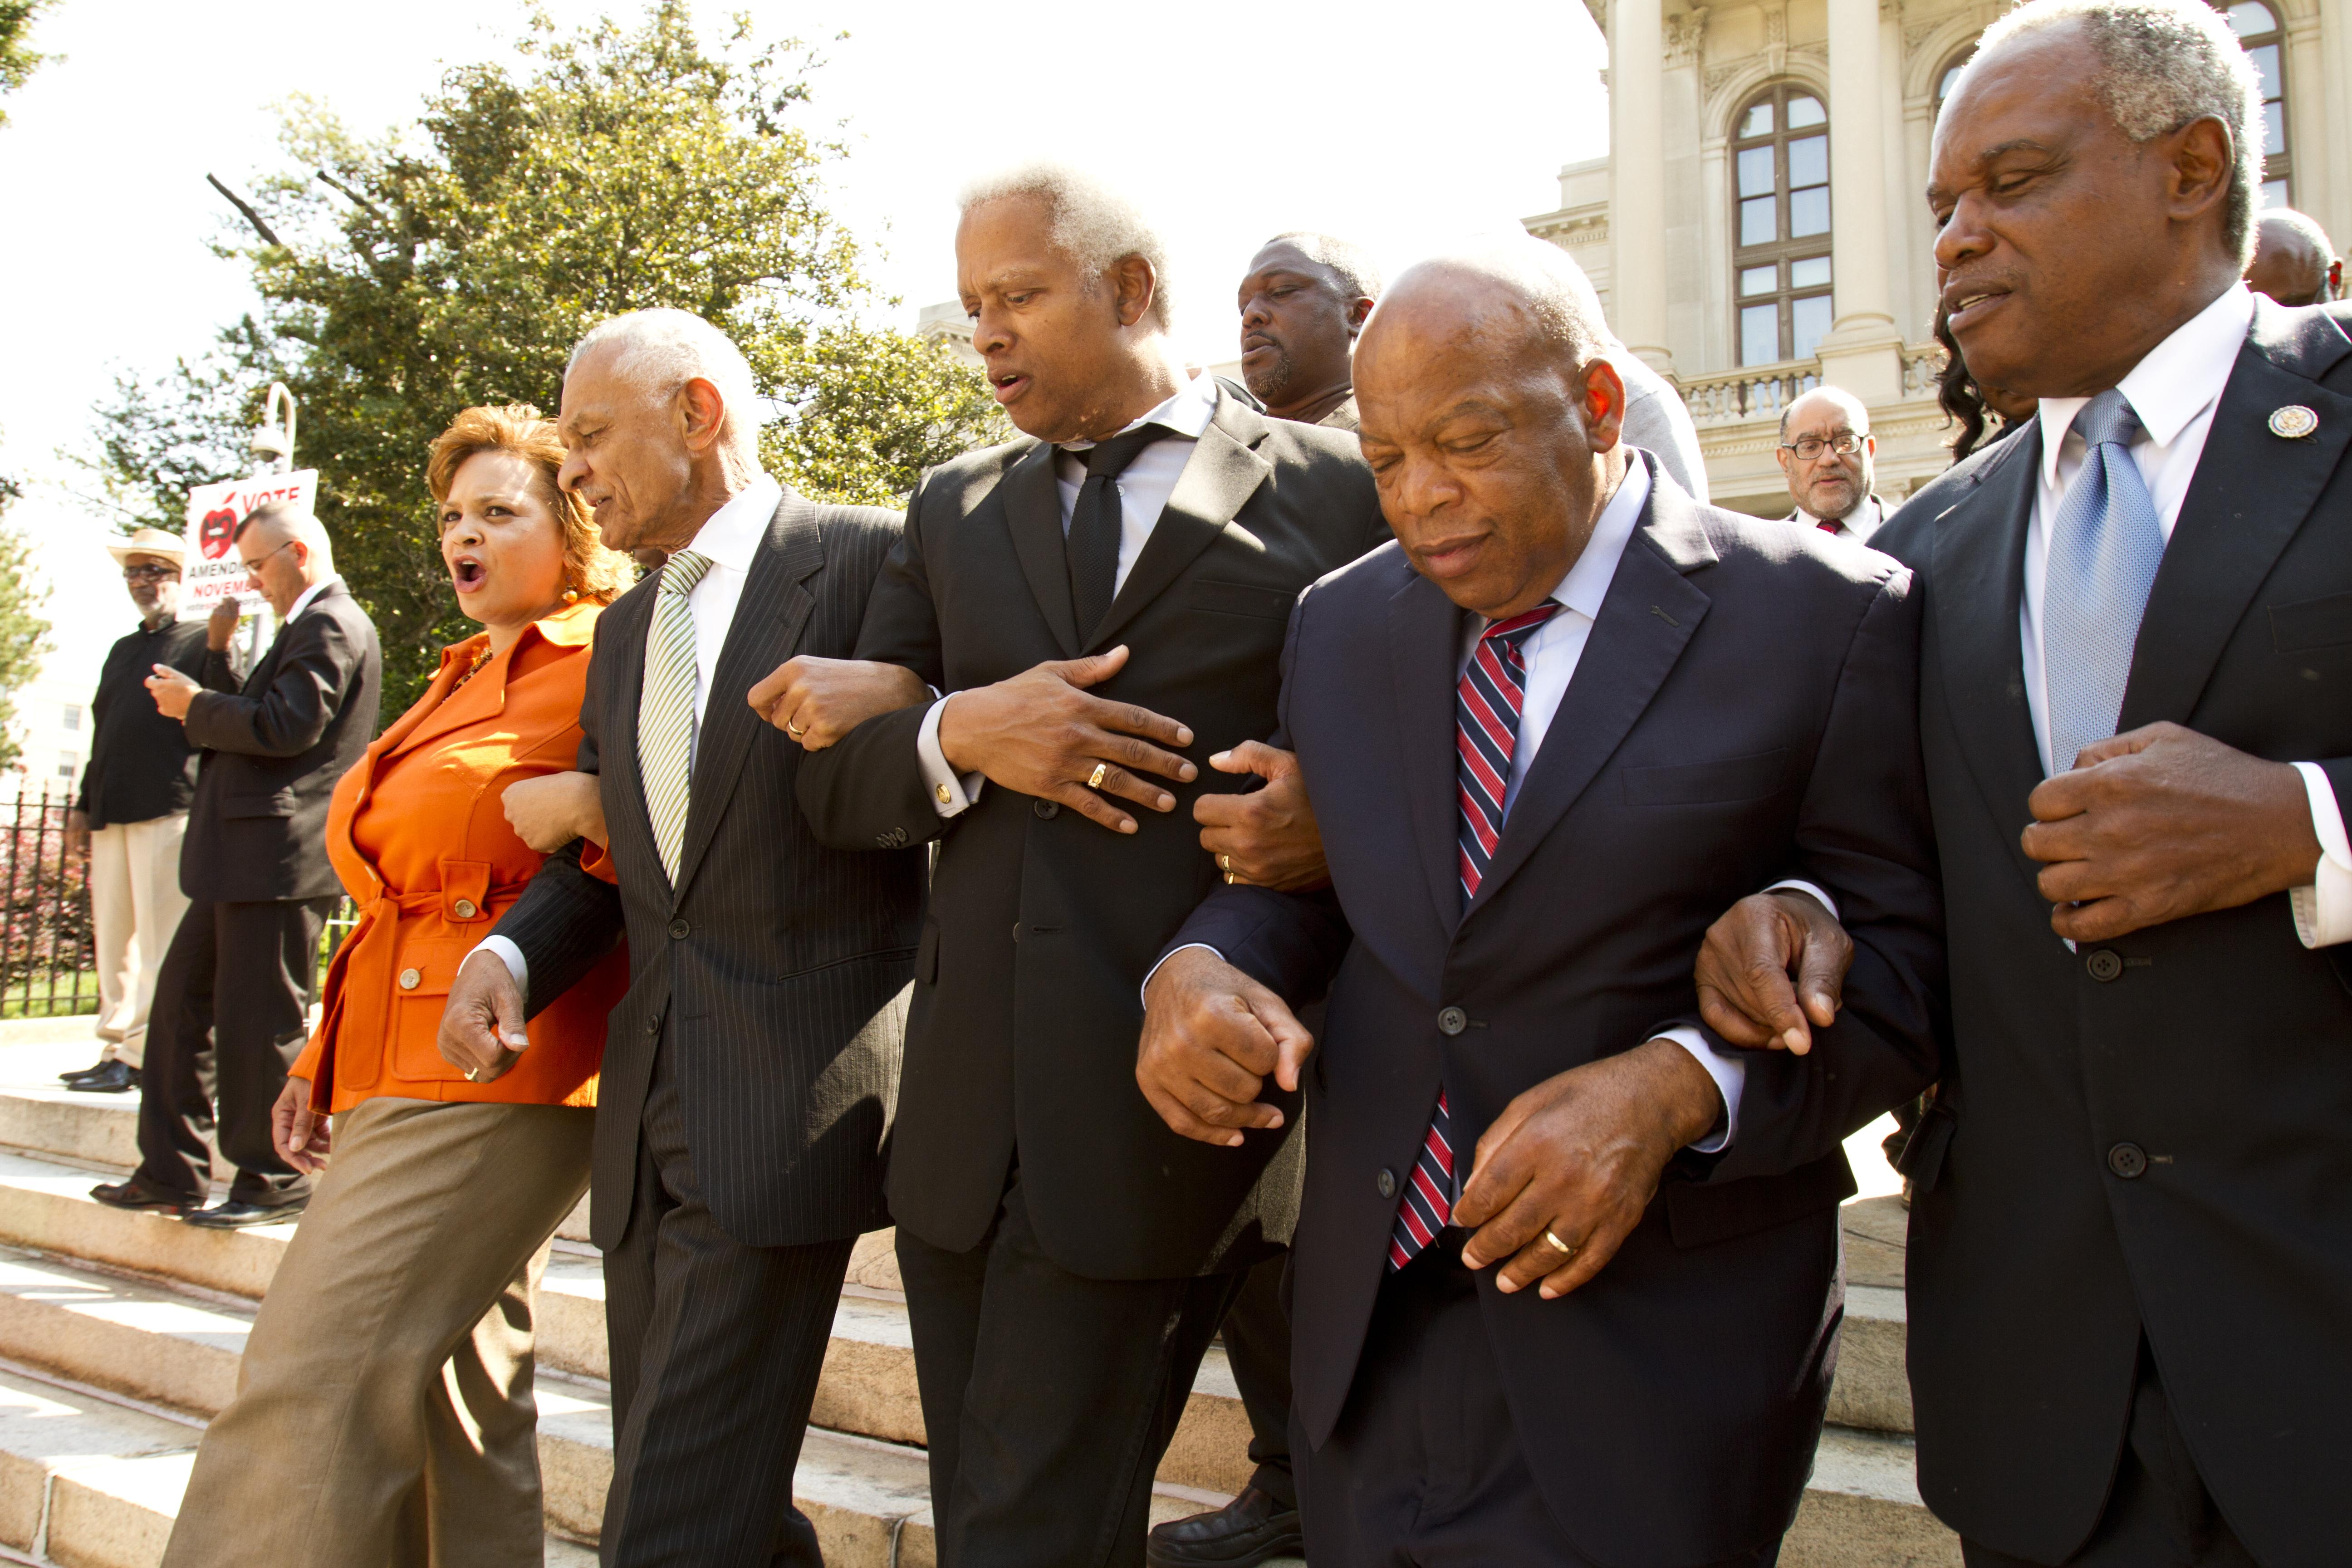 Five people marching arm-in-arm: Deborah Scott, Rev. C.T. Vivian and U.S. Reps. Hank Johnson, John Lewis and David Scott. Photo By John Disney 9-25-2012